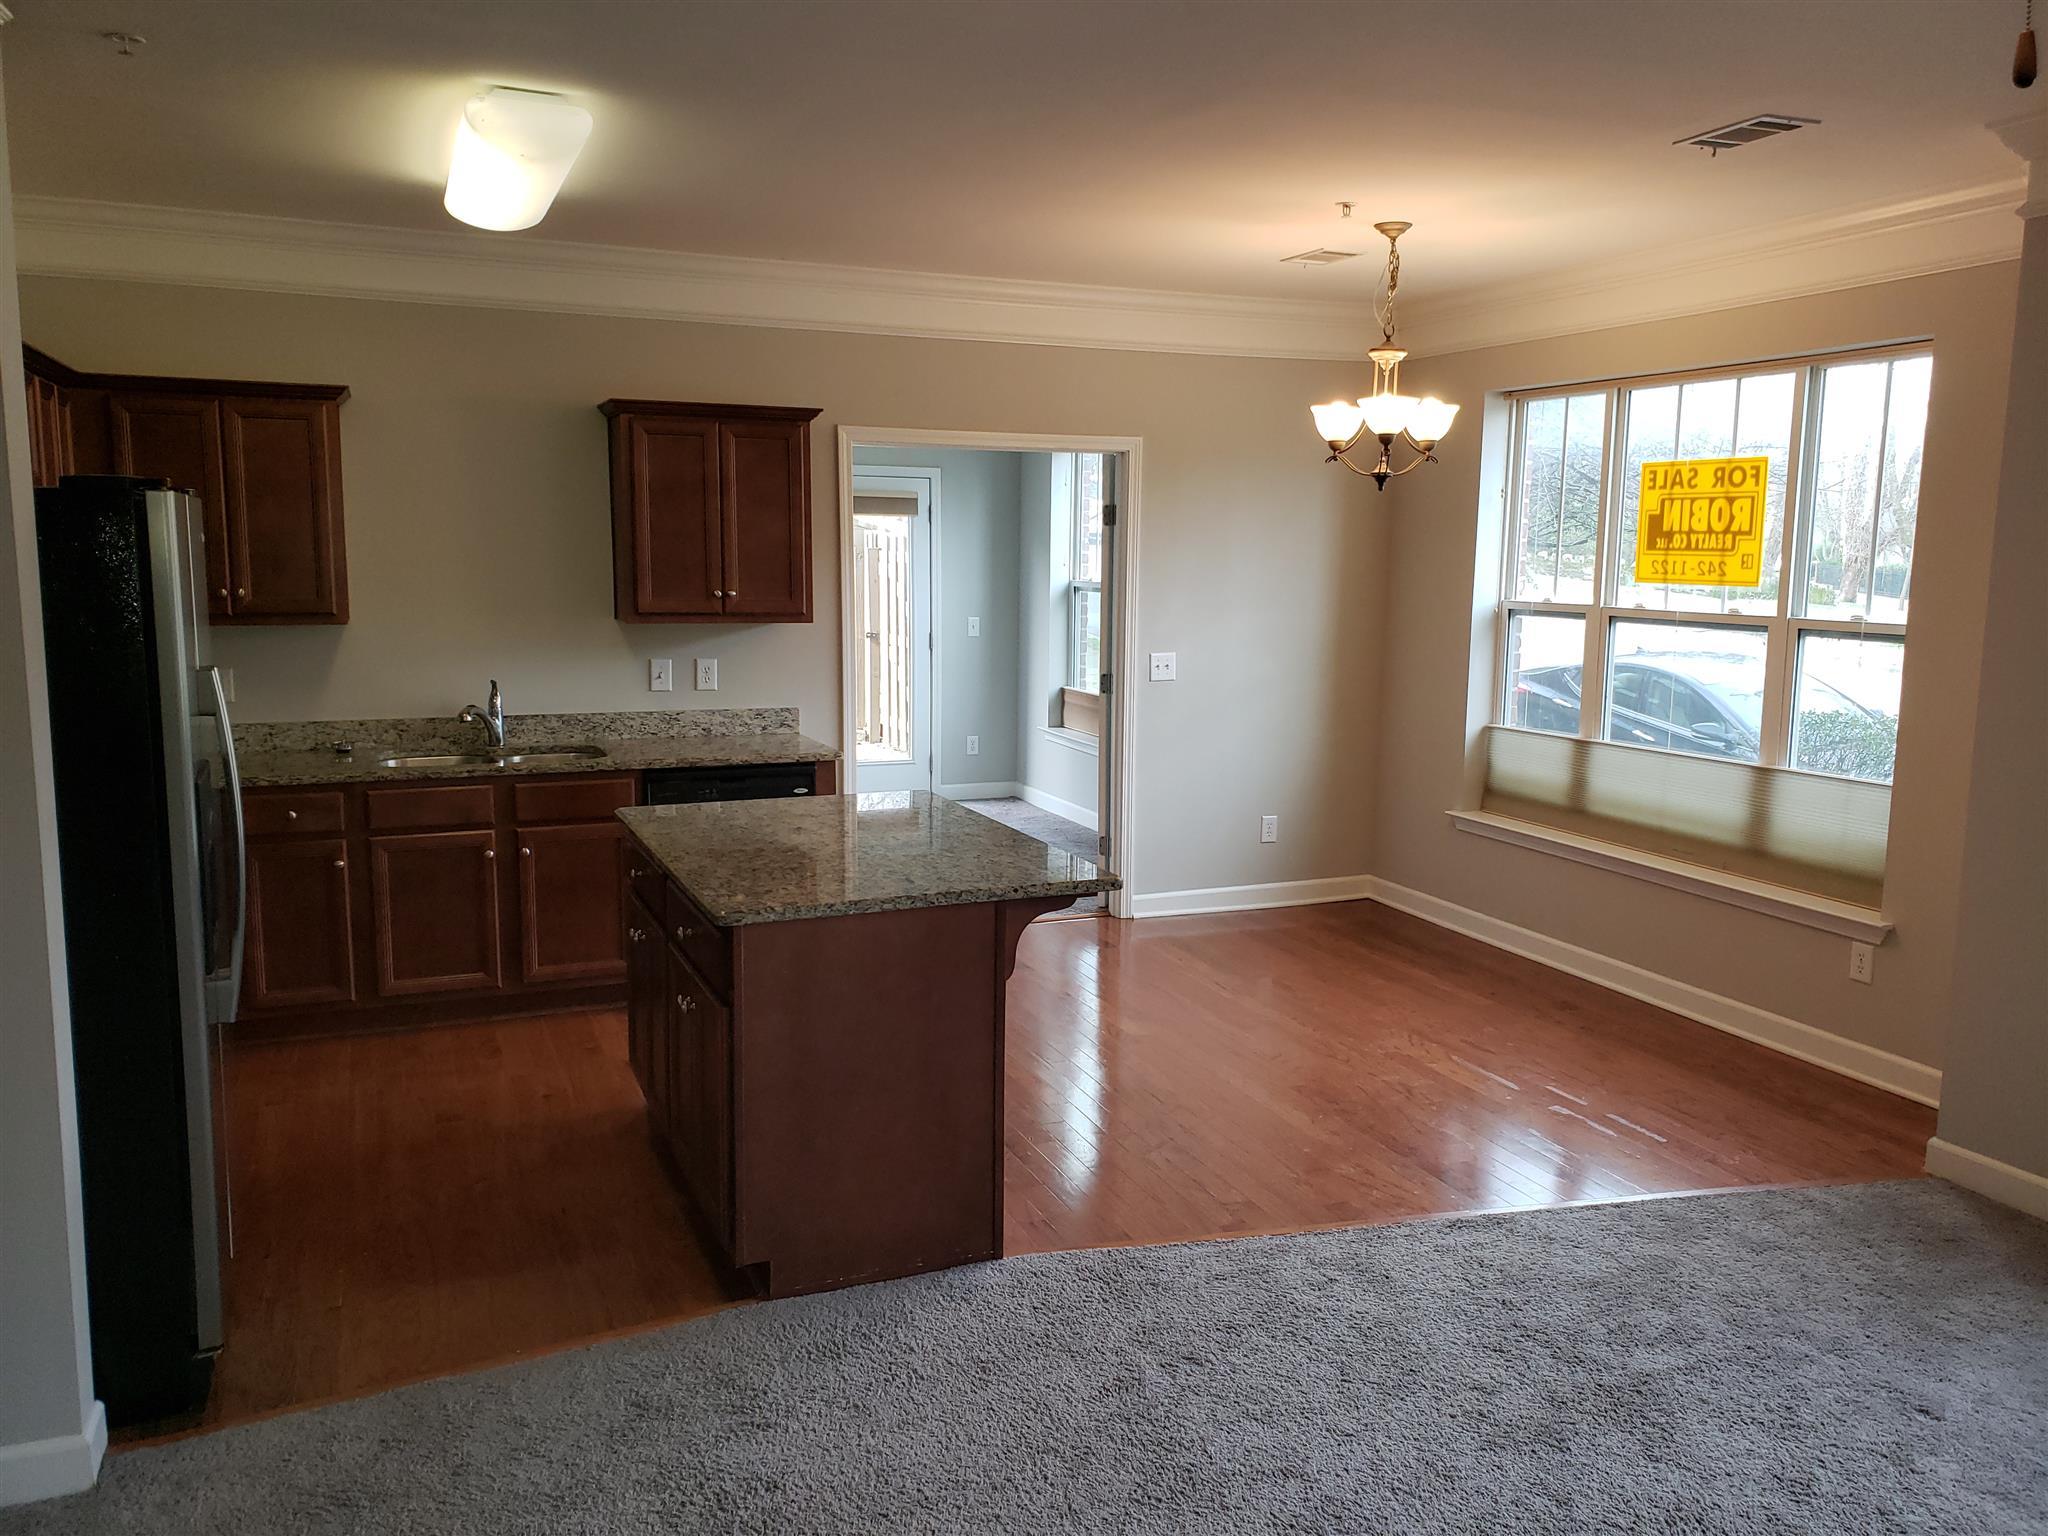 2310 Elliott Ave Apt 801, Nashville-Southeast in Davidson County County, TN 37204 Home for Sale